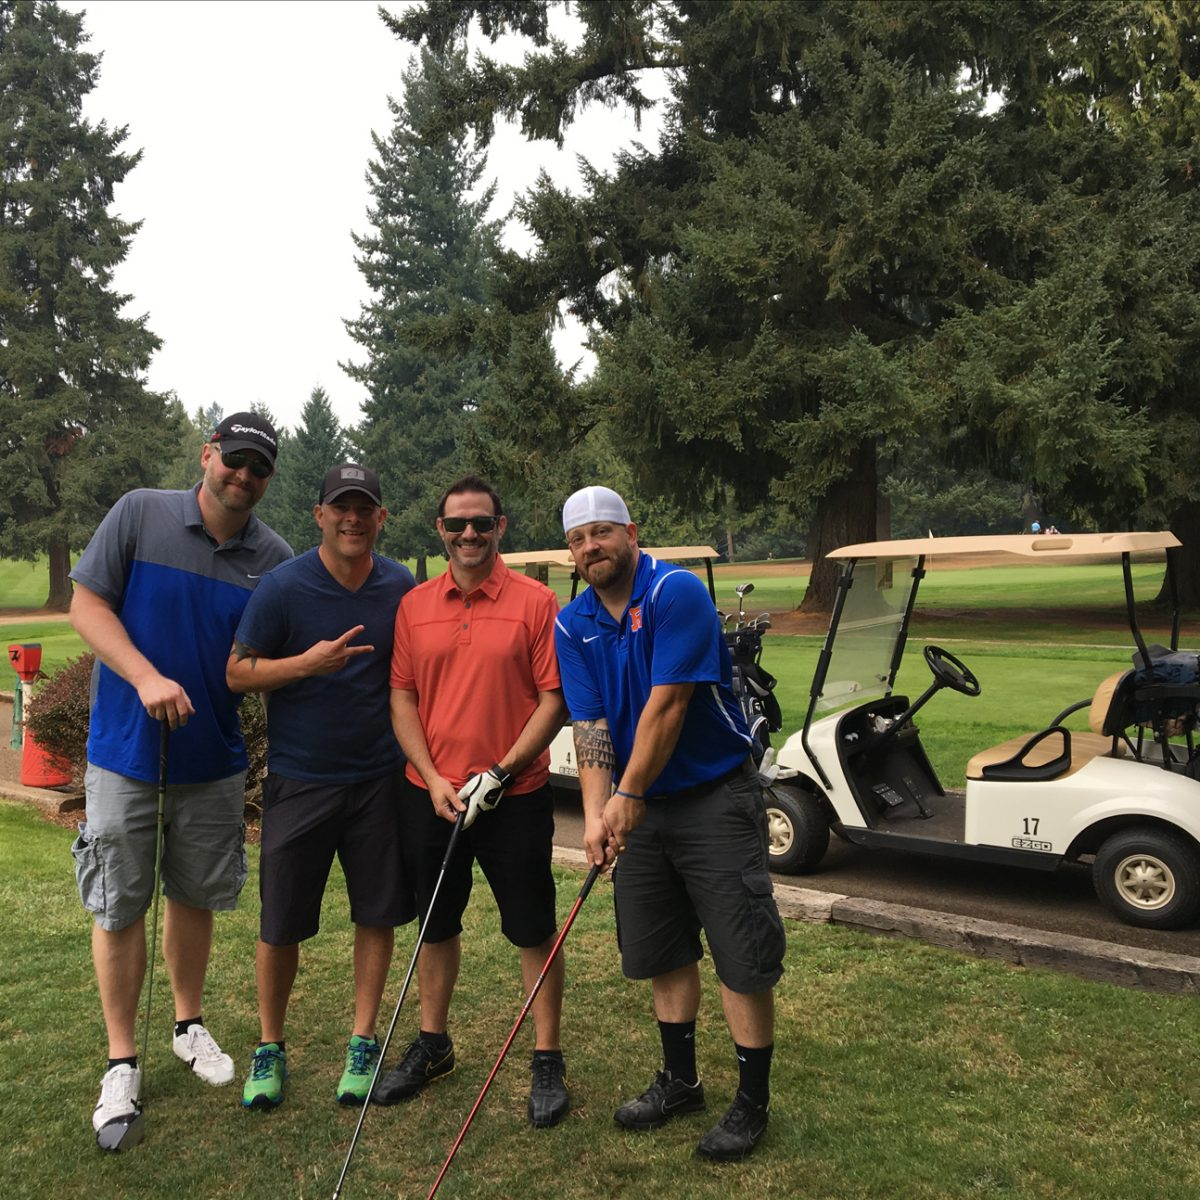 golf courses in oregon city